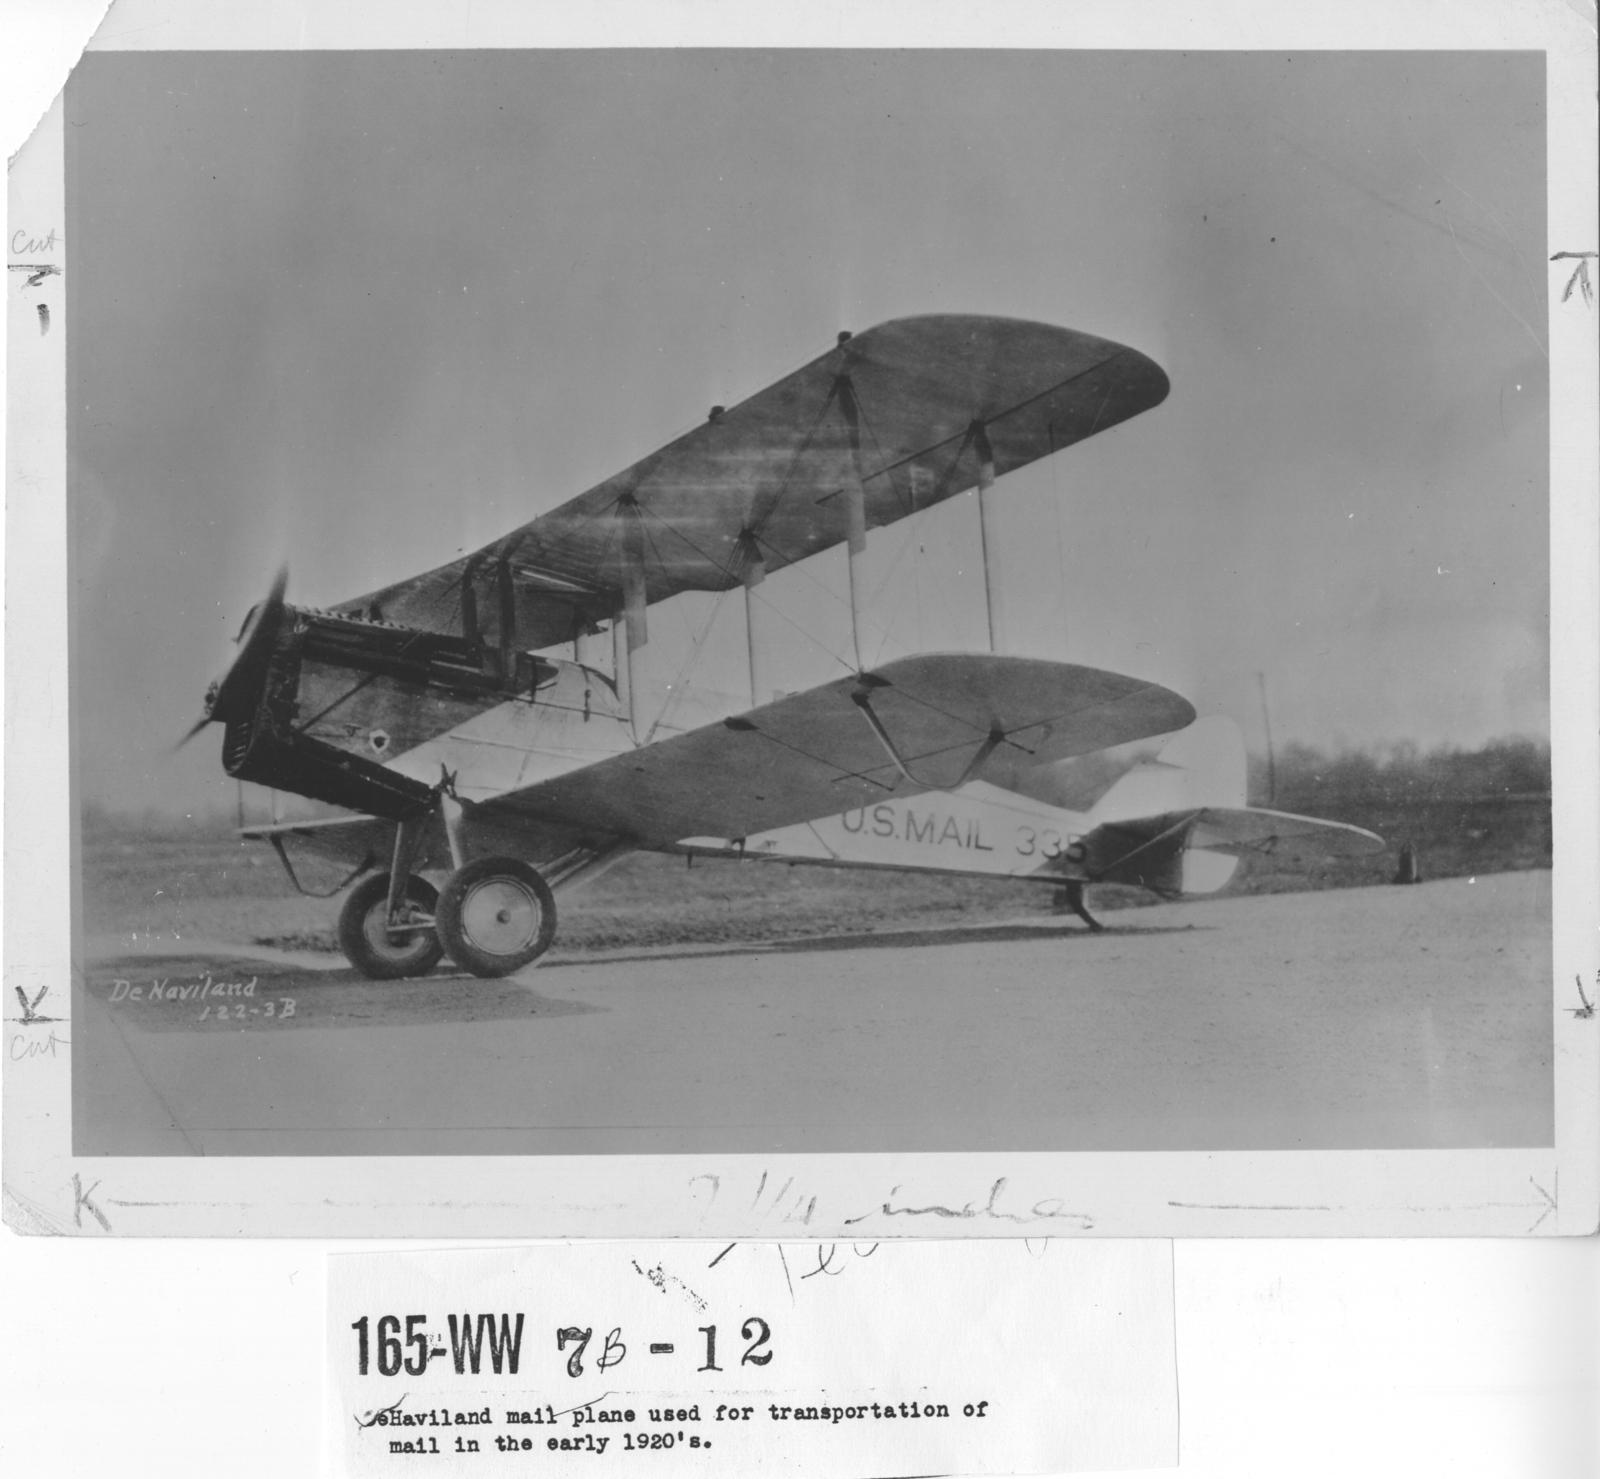 De Haviland Mail Plane Used For